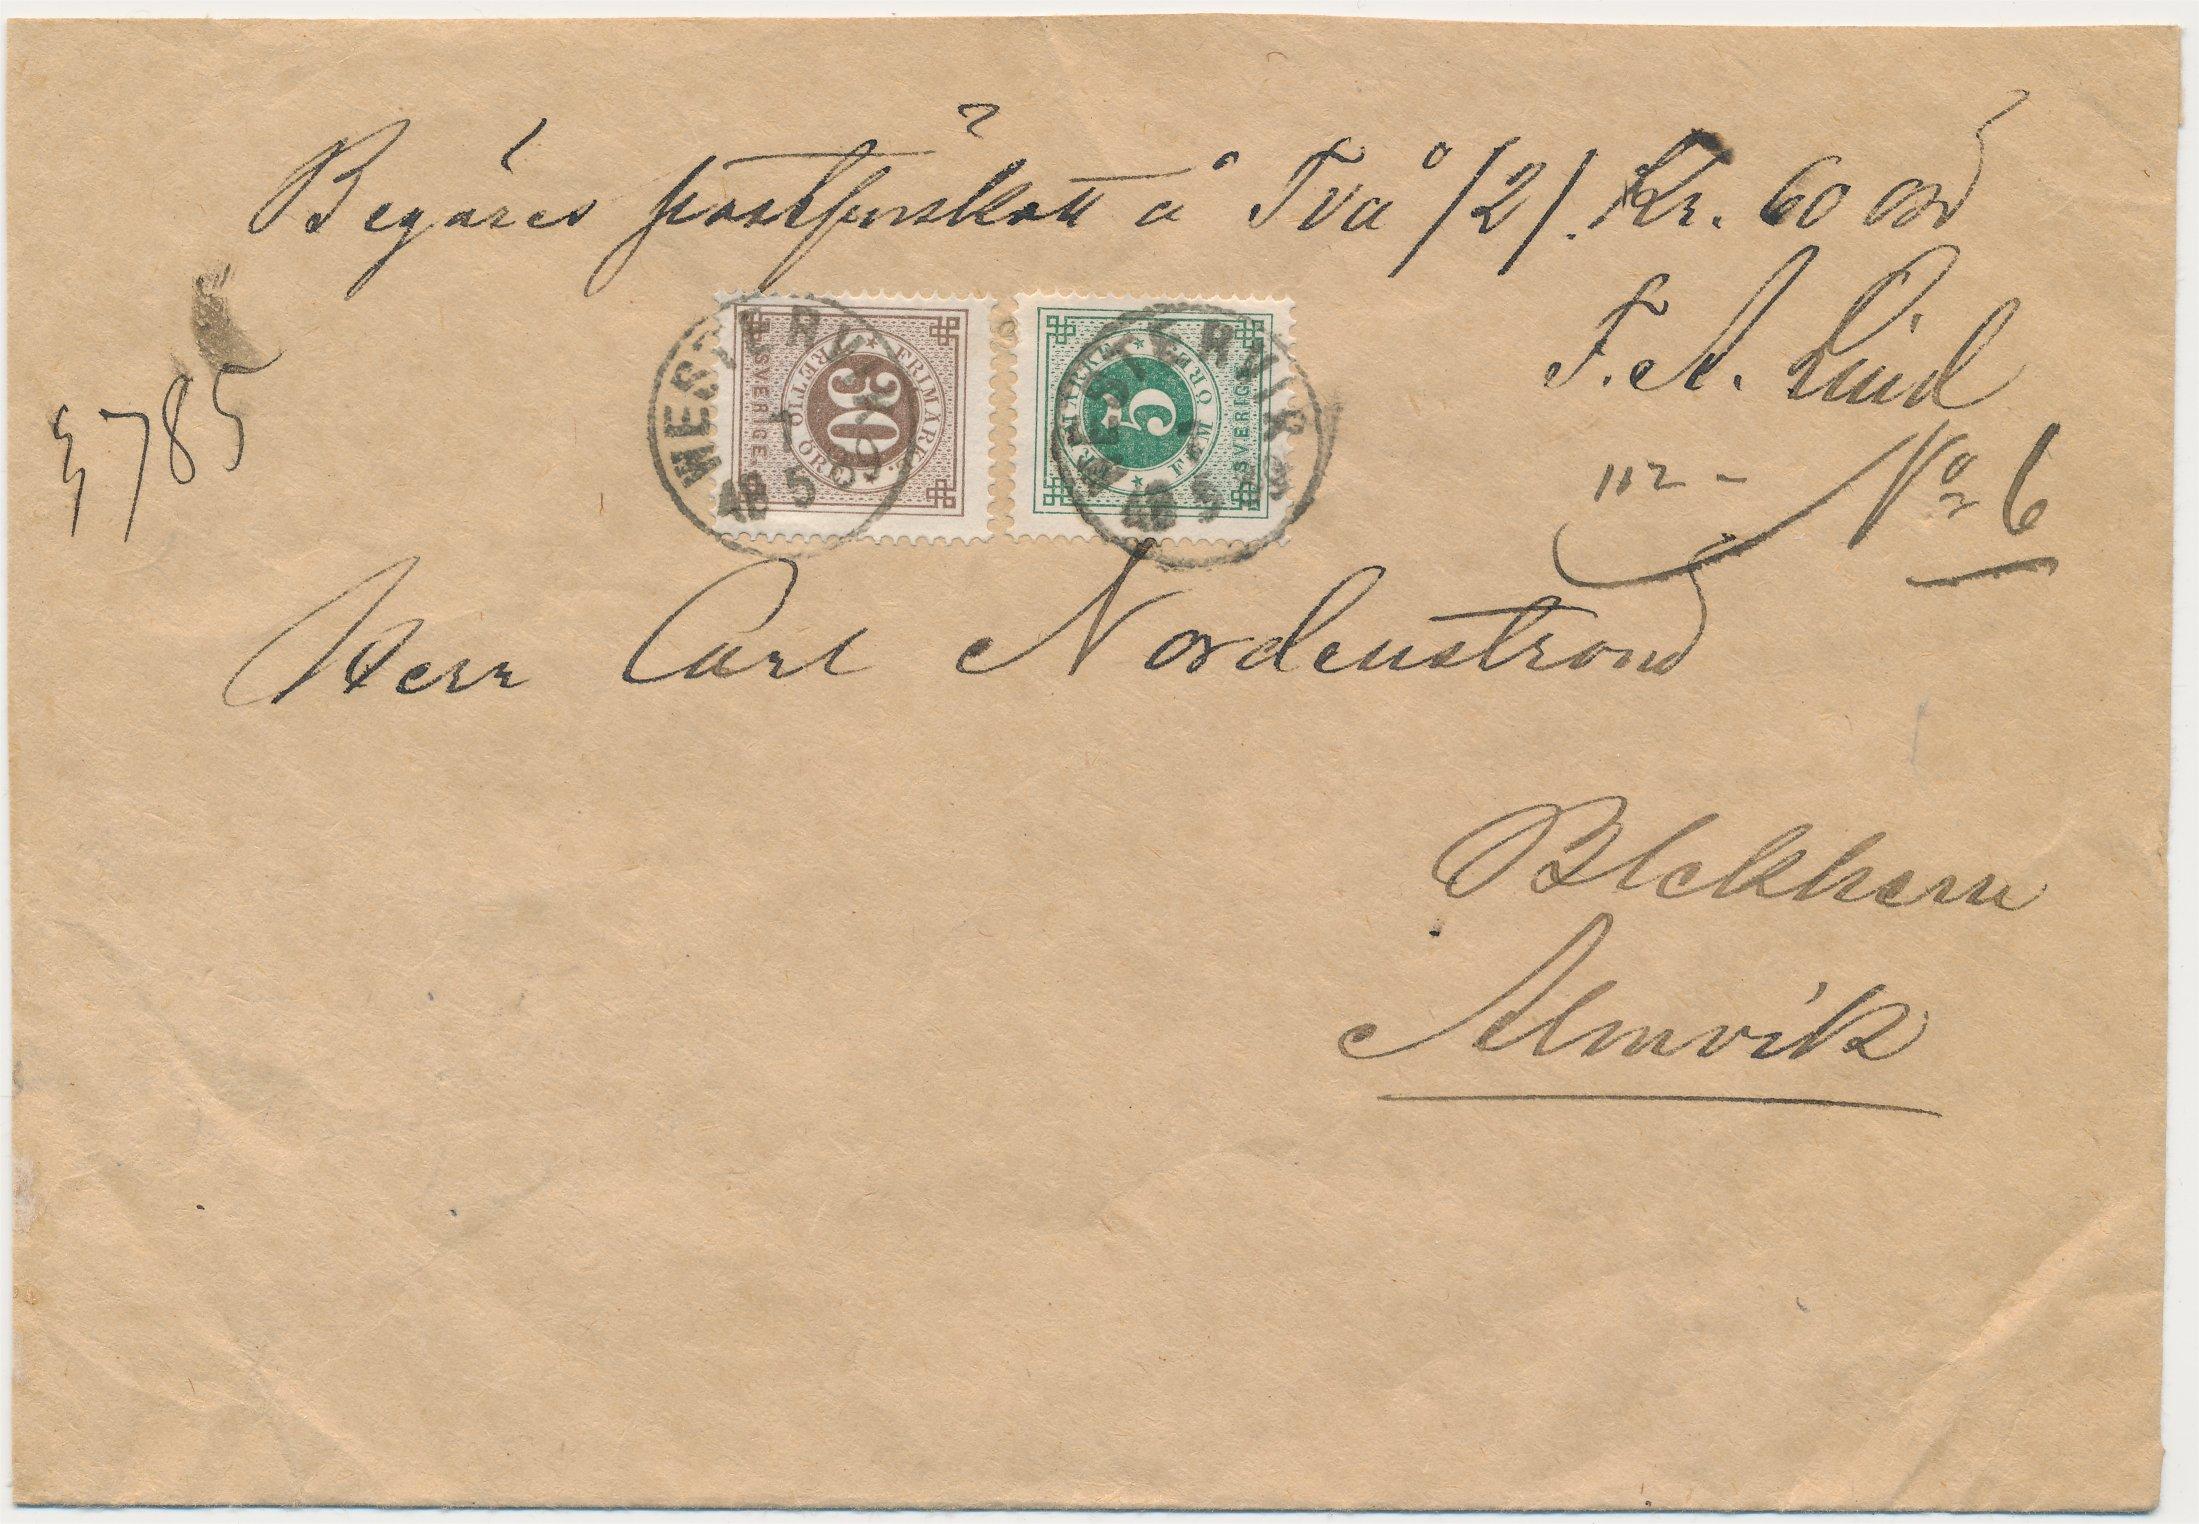 35_westervik_7_5_1889